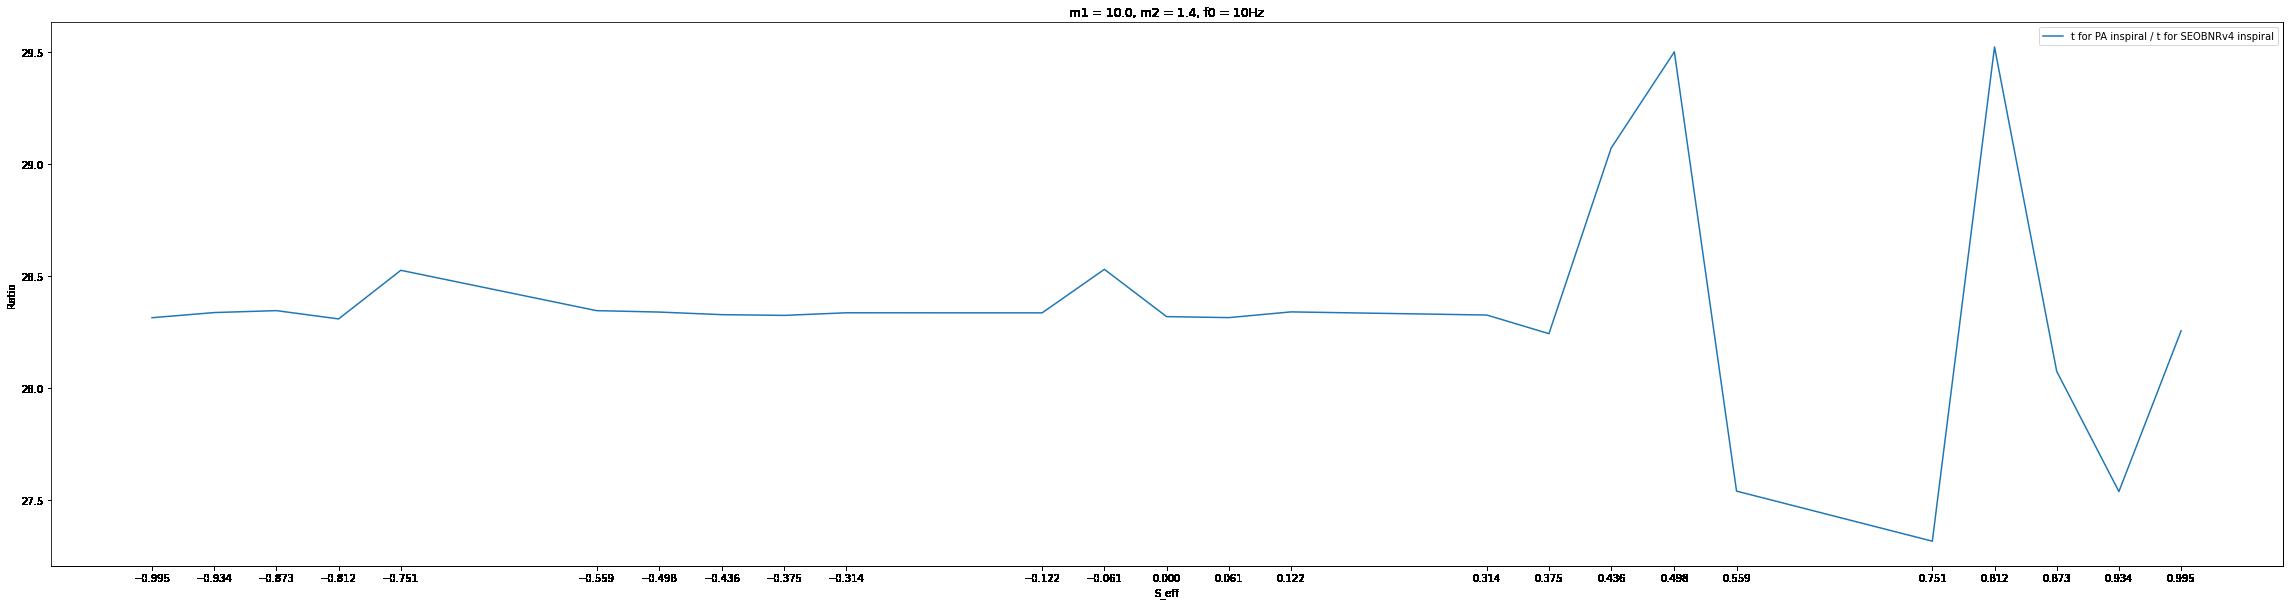 plots/m1_10_ratio_plot.png